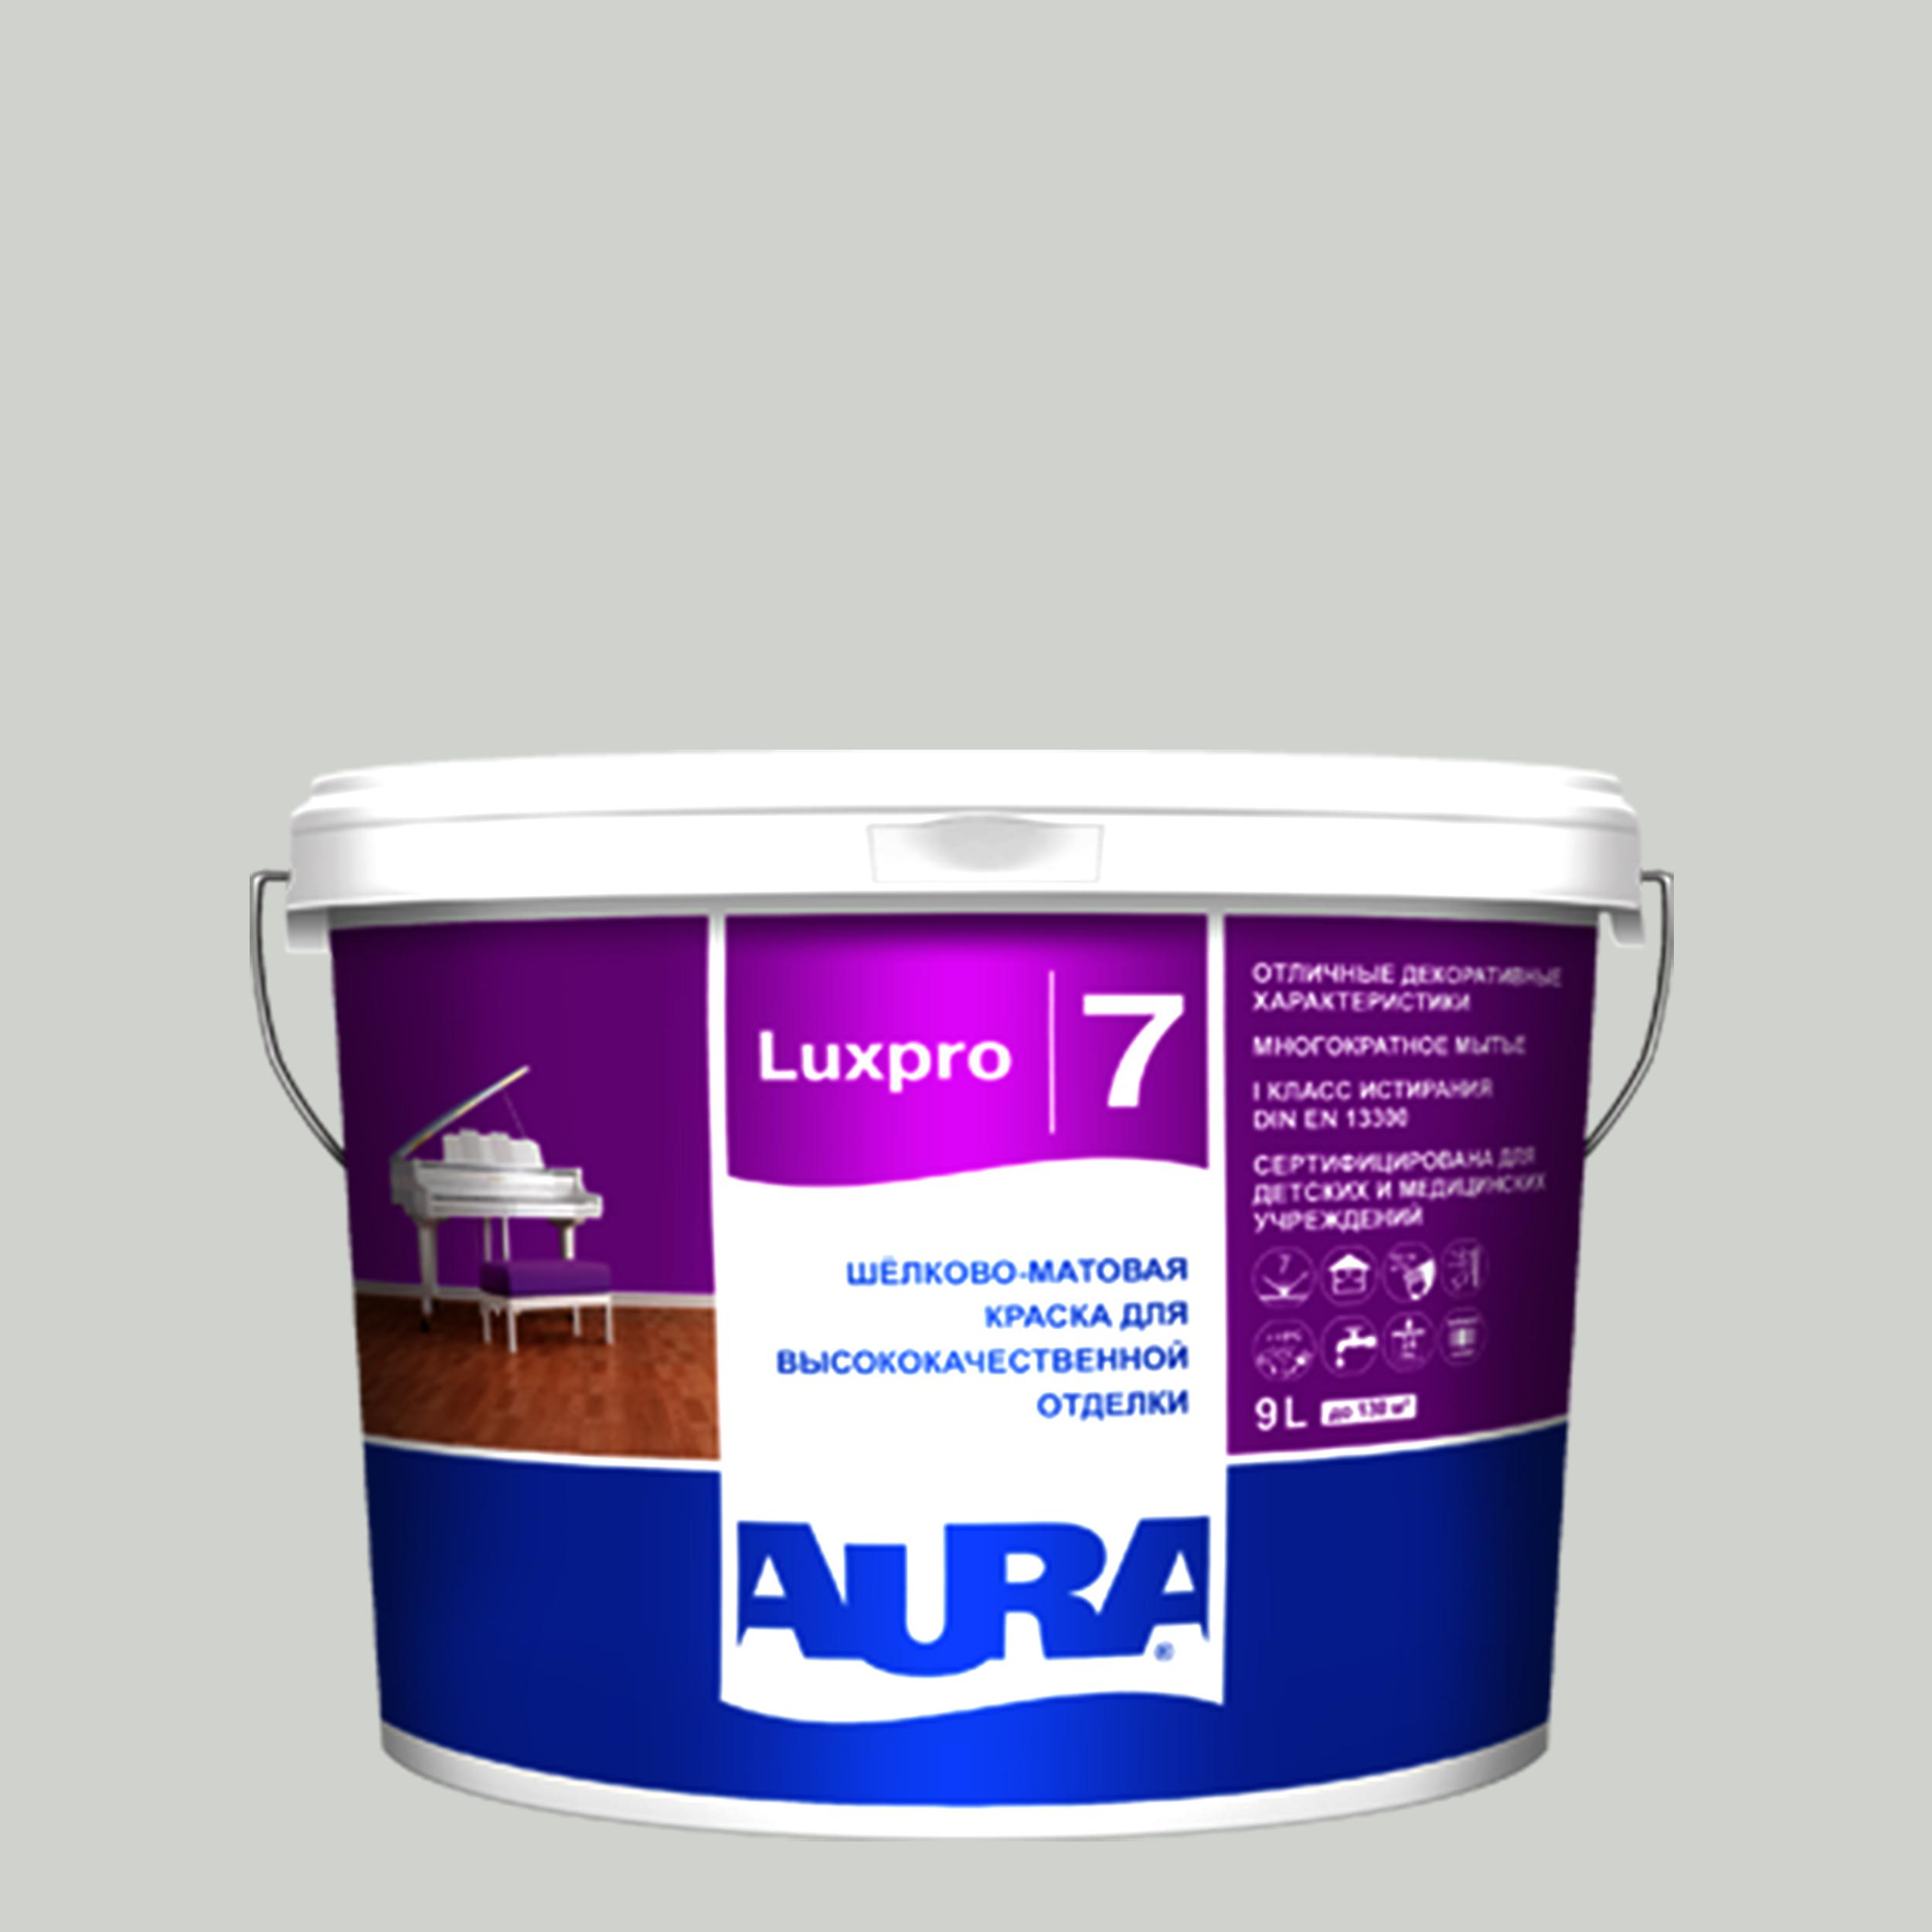 Фото 4 - Краска интерьерная, Aura LuxPRO 7, RAL 6016, 11 кг.